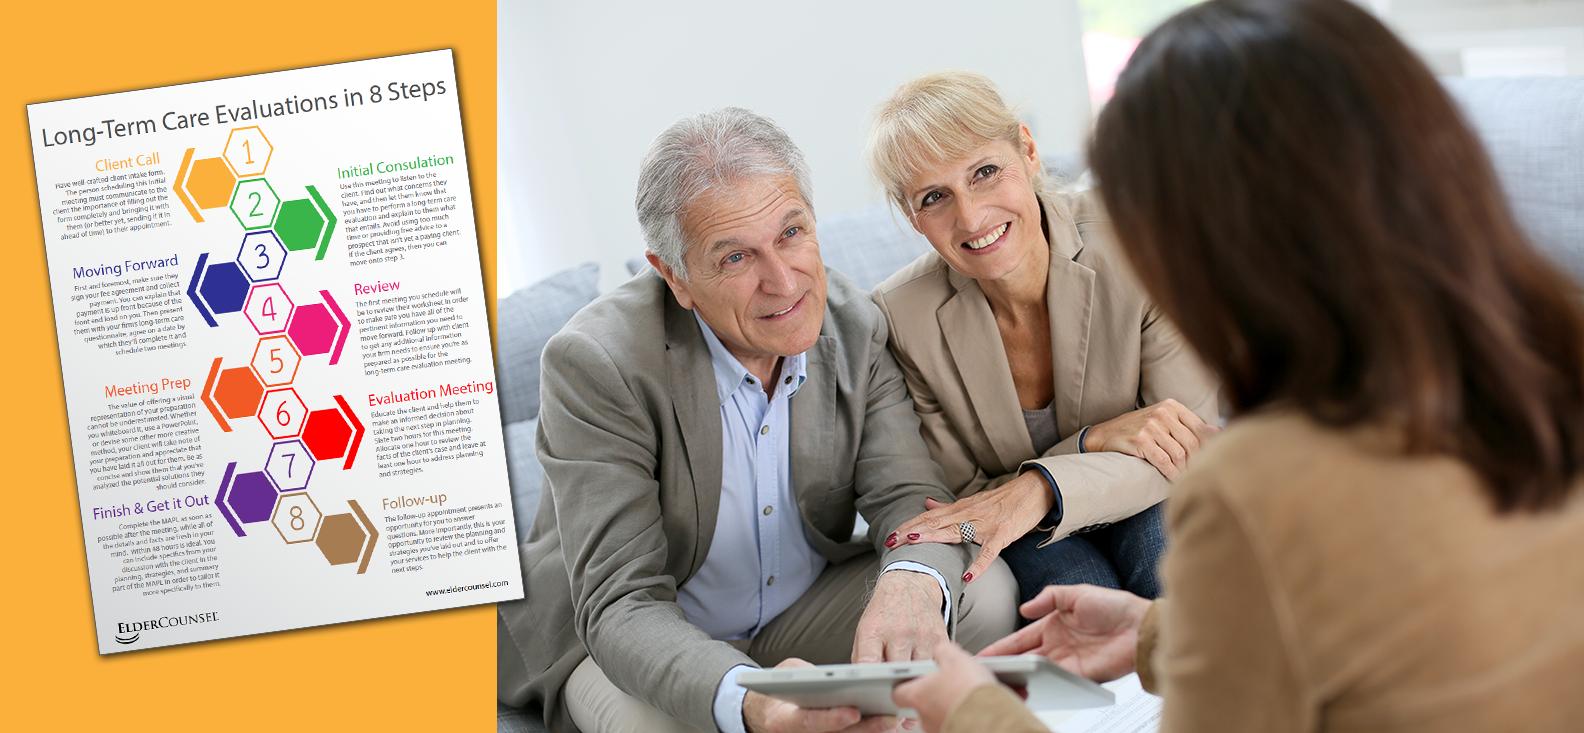 long-term-care-eval-in-8-steps-header-1